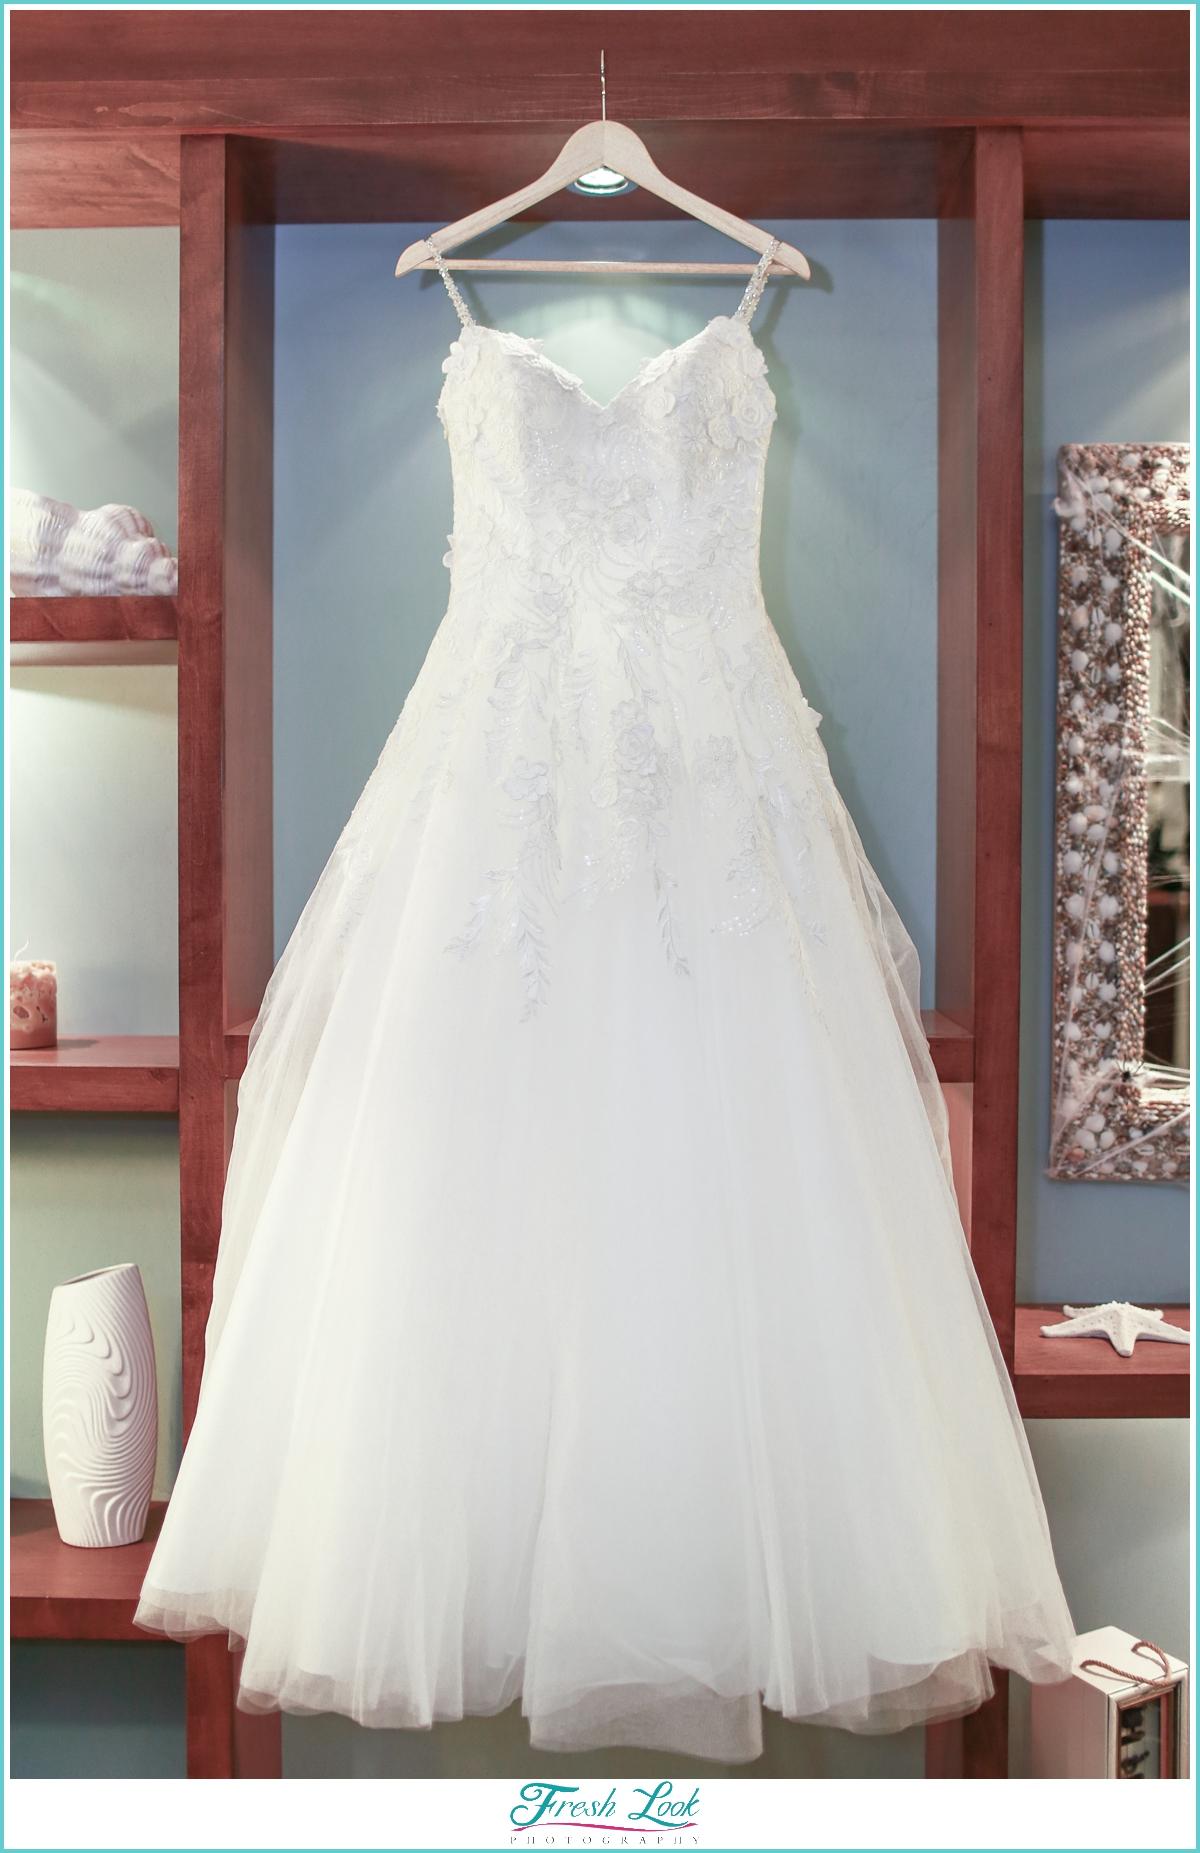 Bridal Gown detail shot